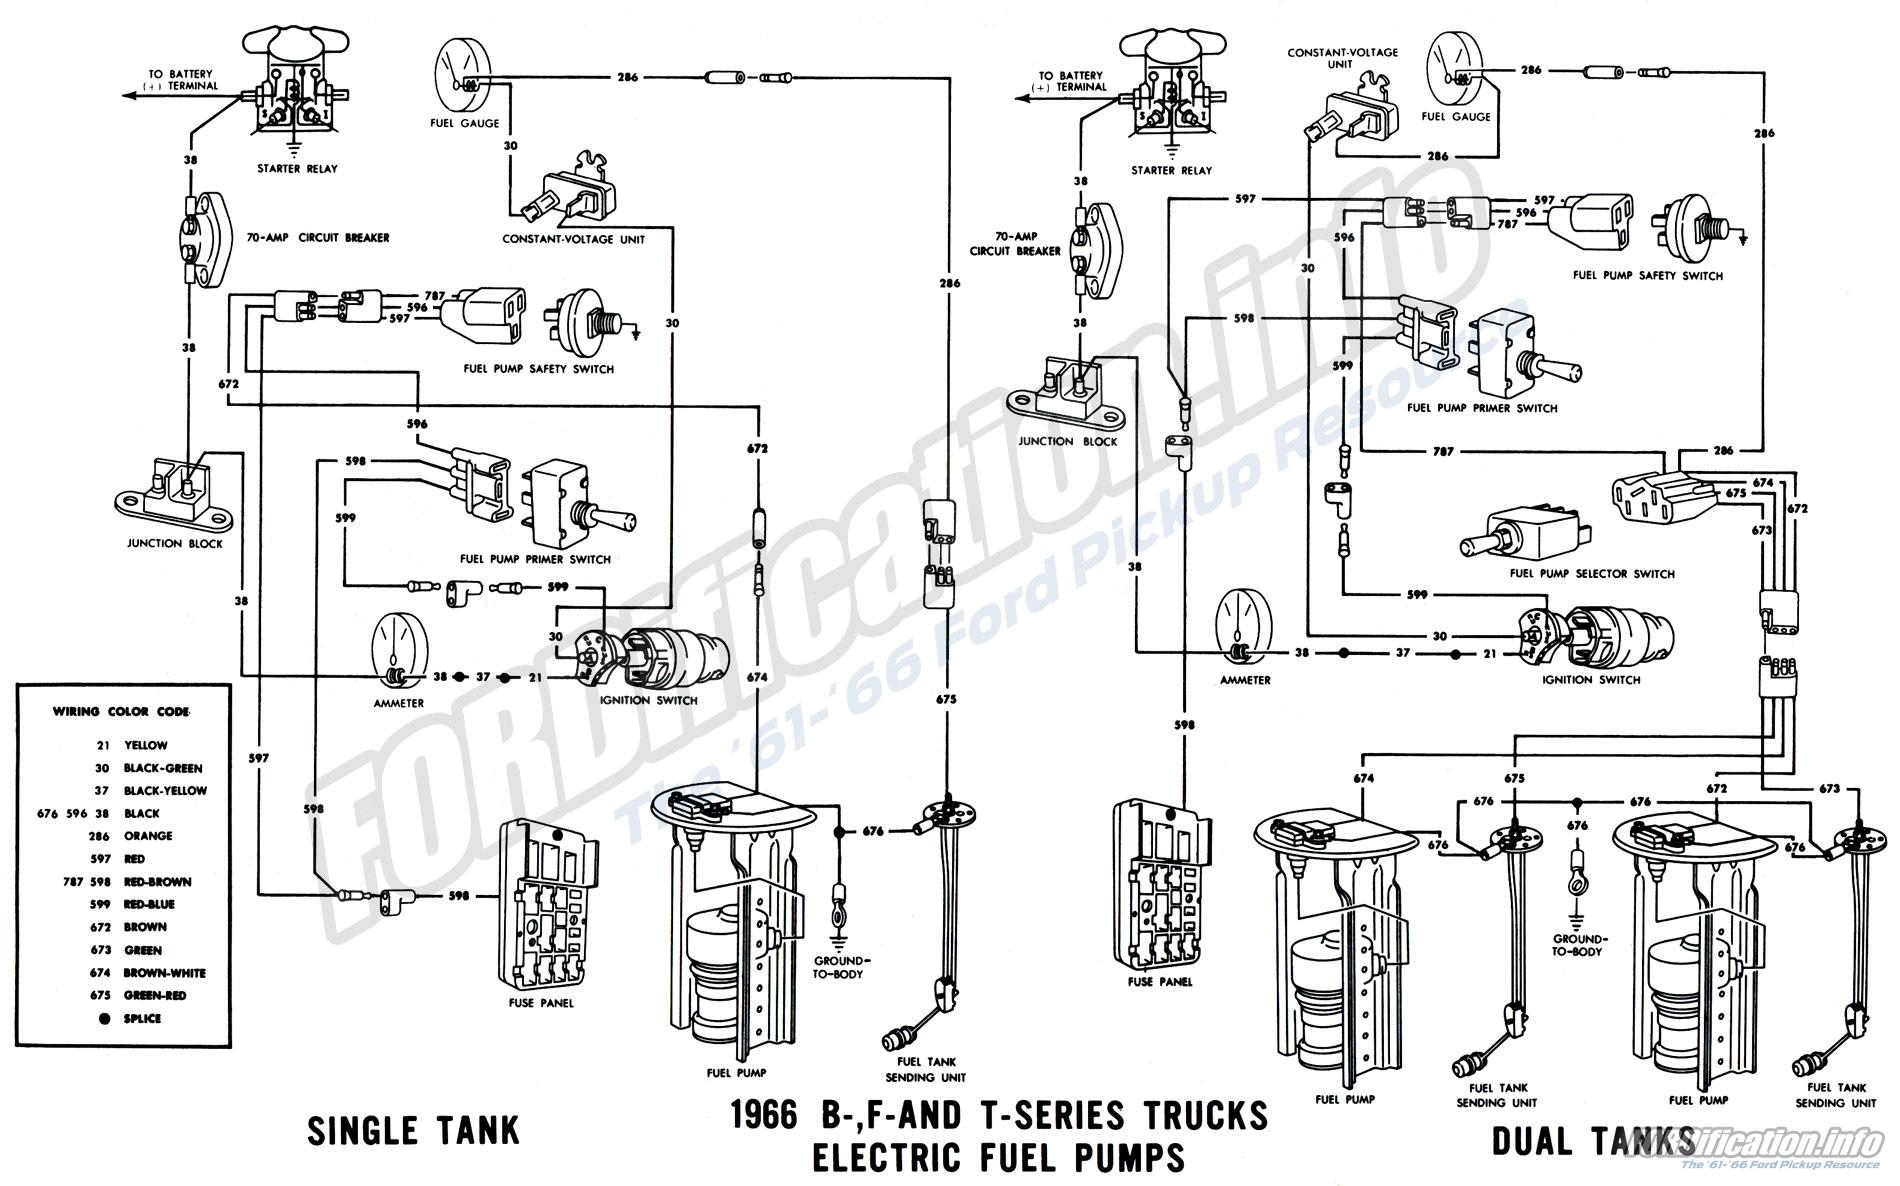 fairlane wiring diagram in addition ford thunderbird wiring diagram